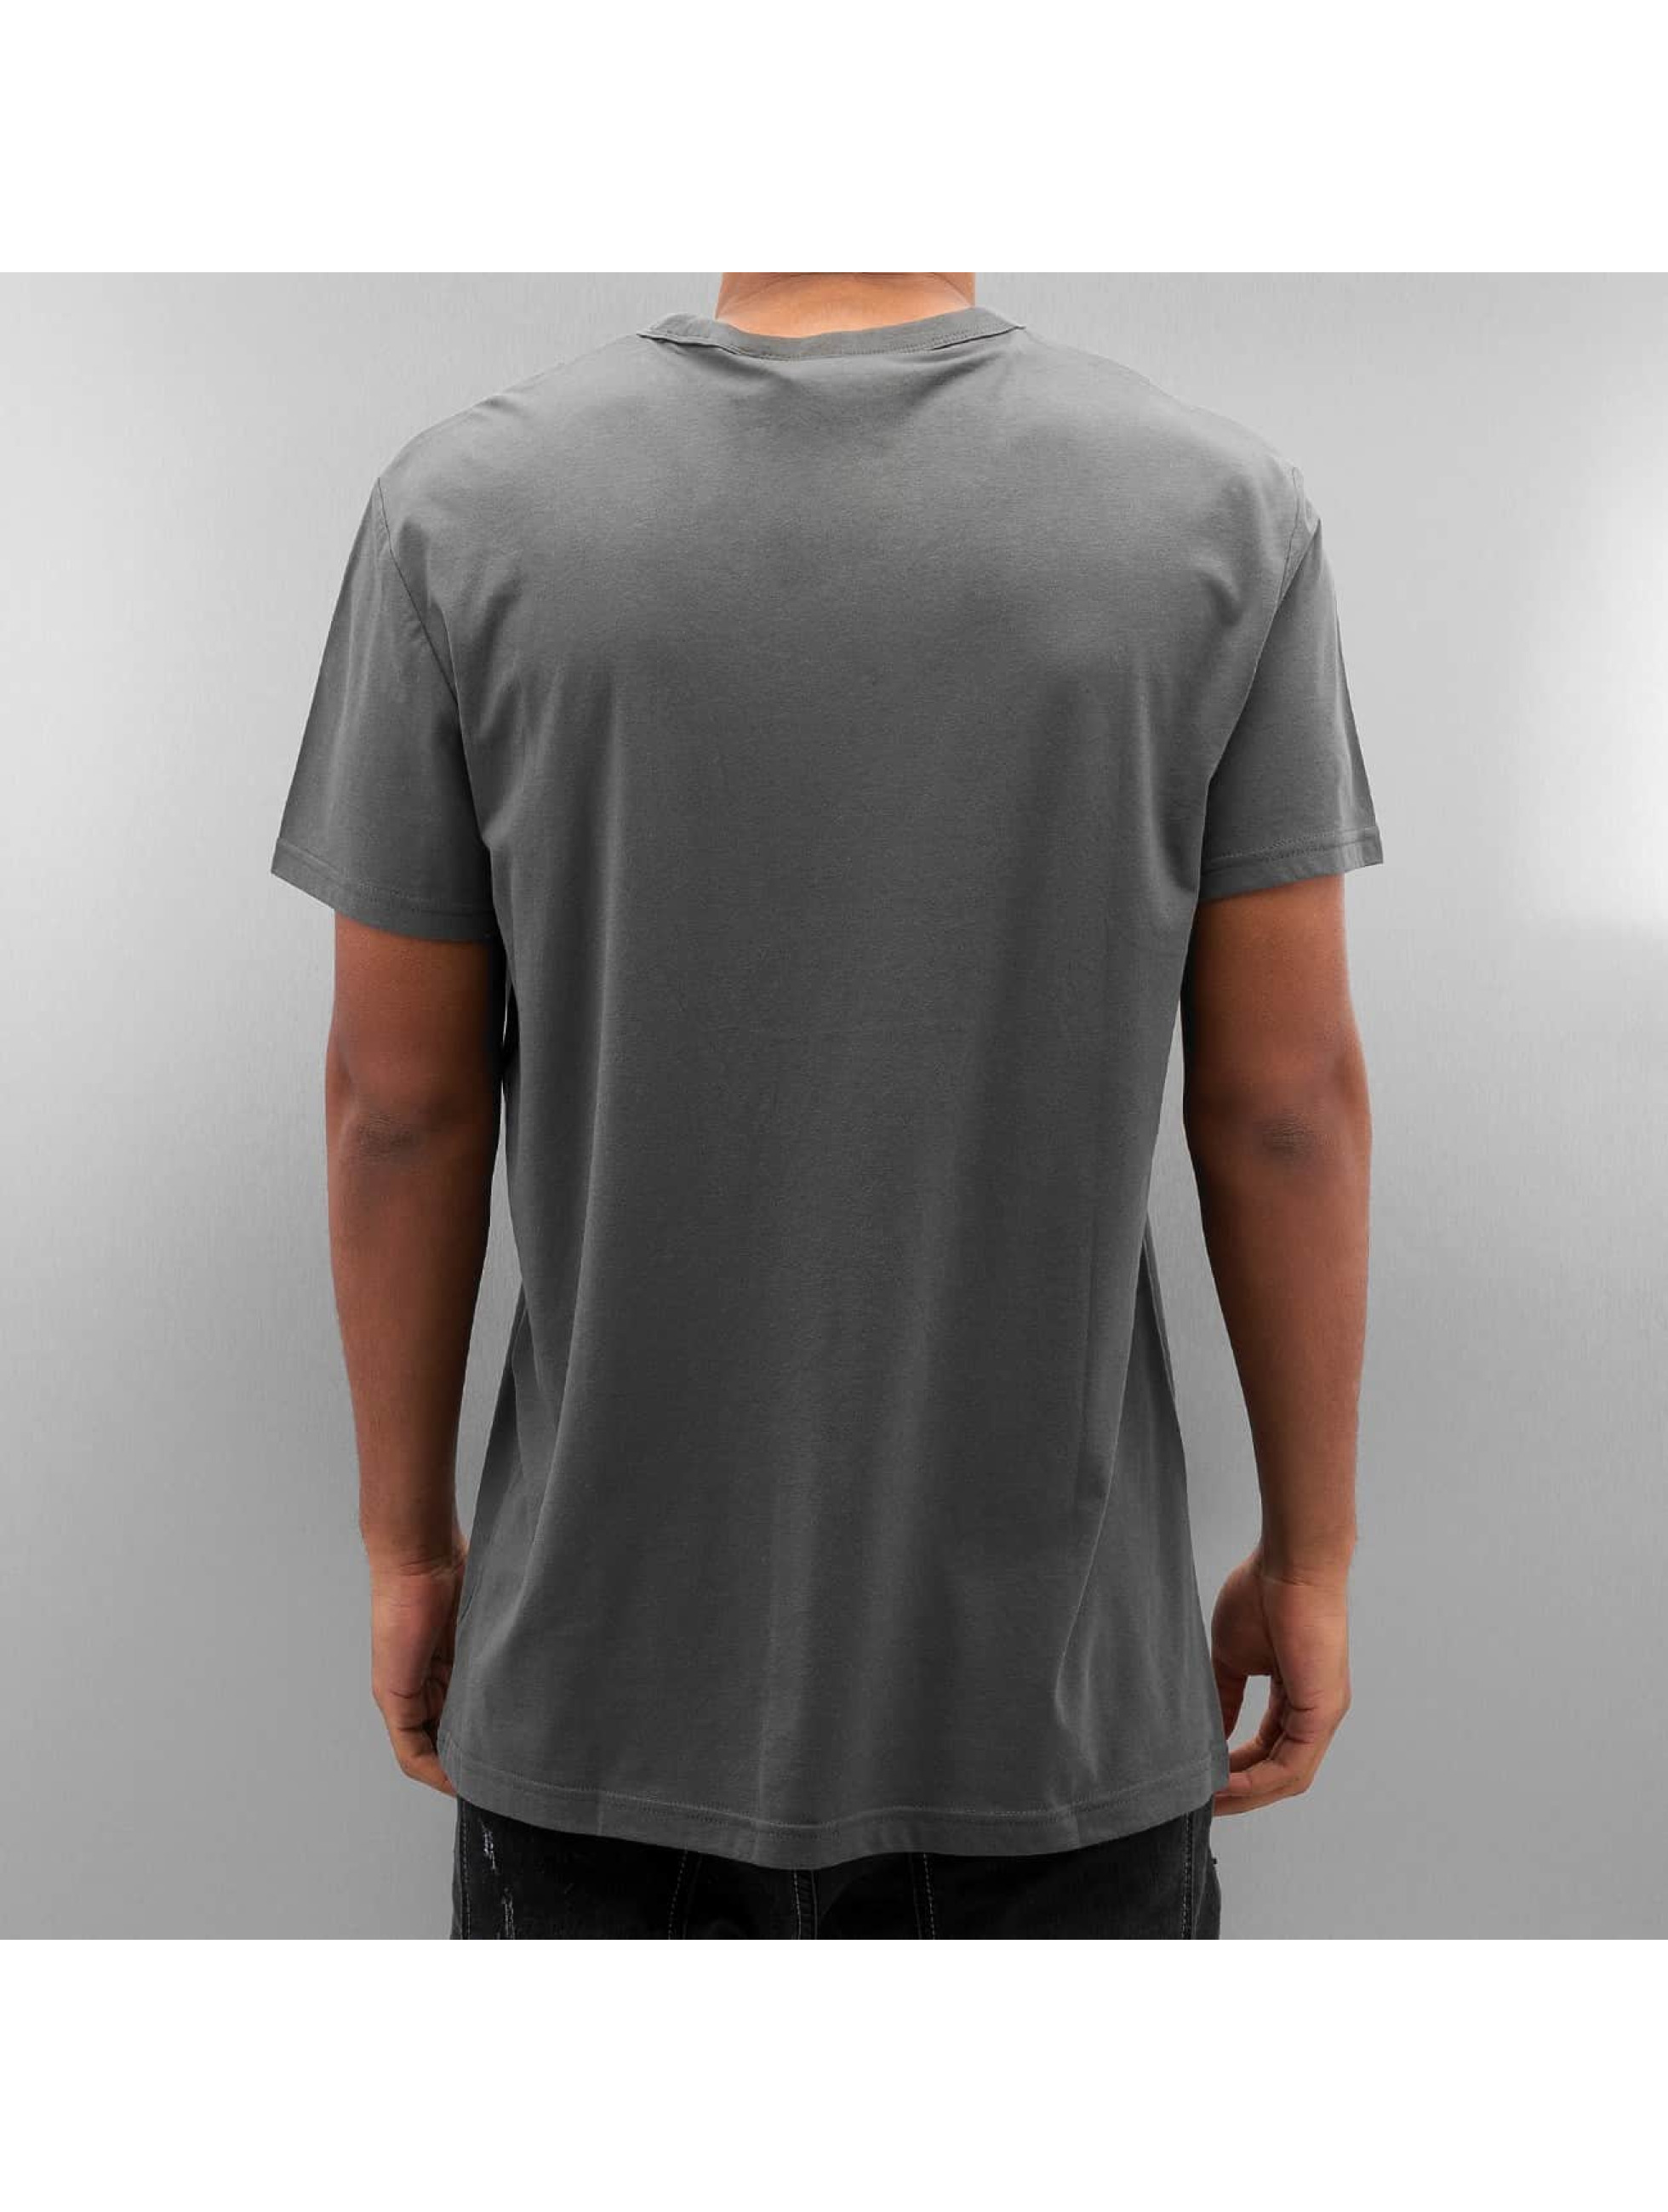 G-Star T-Shirt Cadulor gray